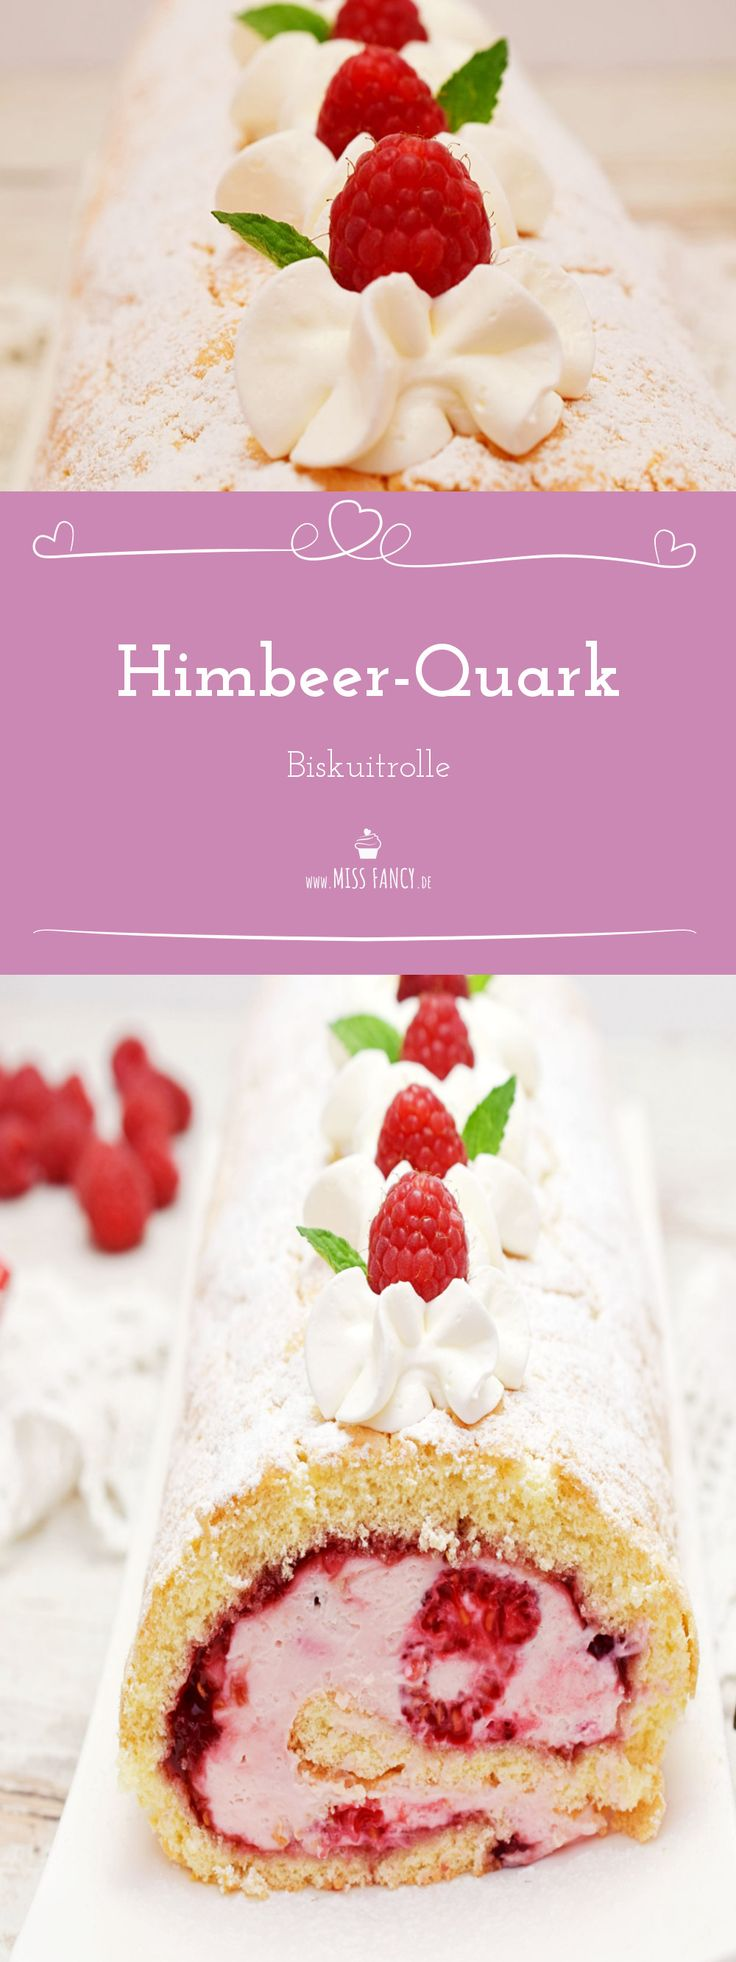 Leckere Himbeer-Quark-Rolle mit fluffigem Biskuit :-)